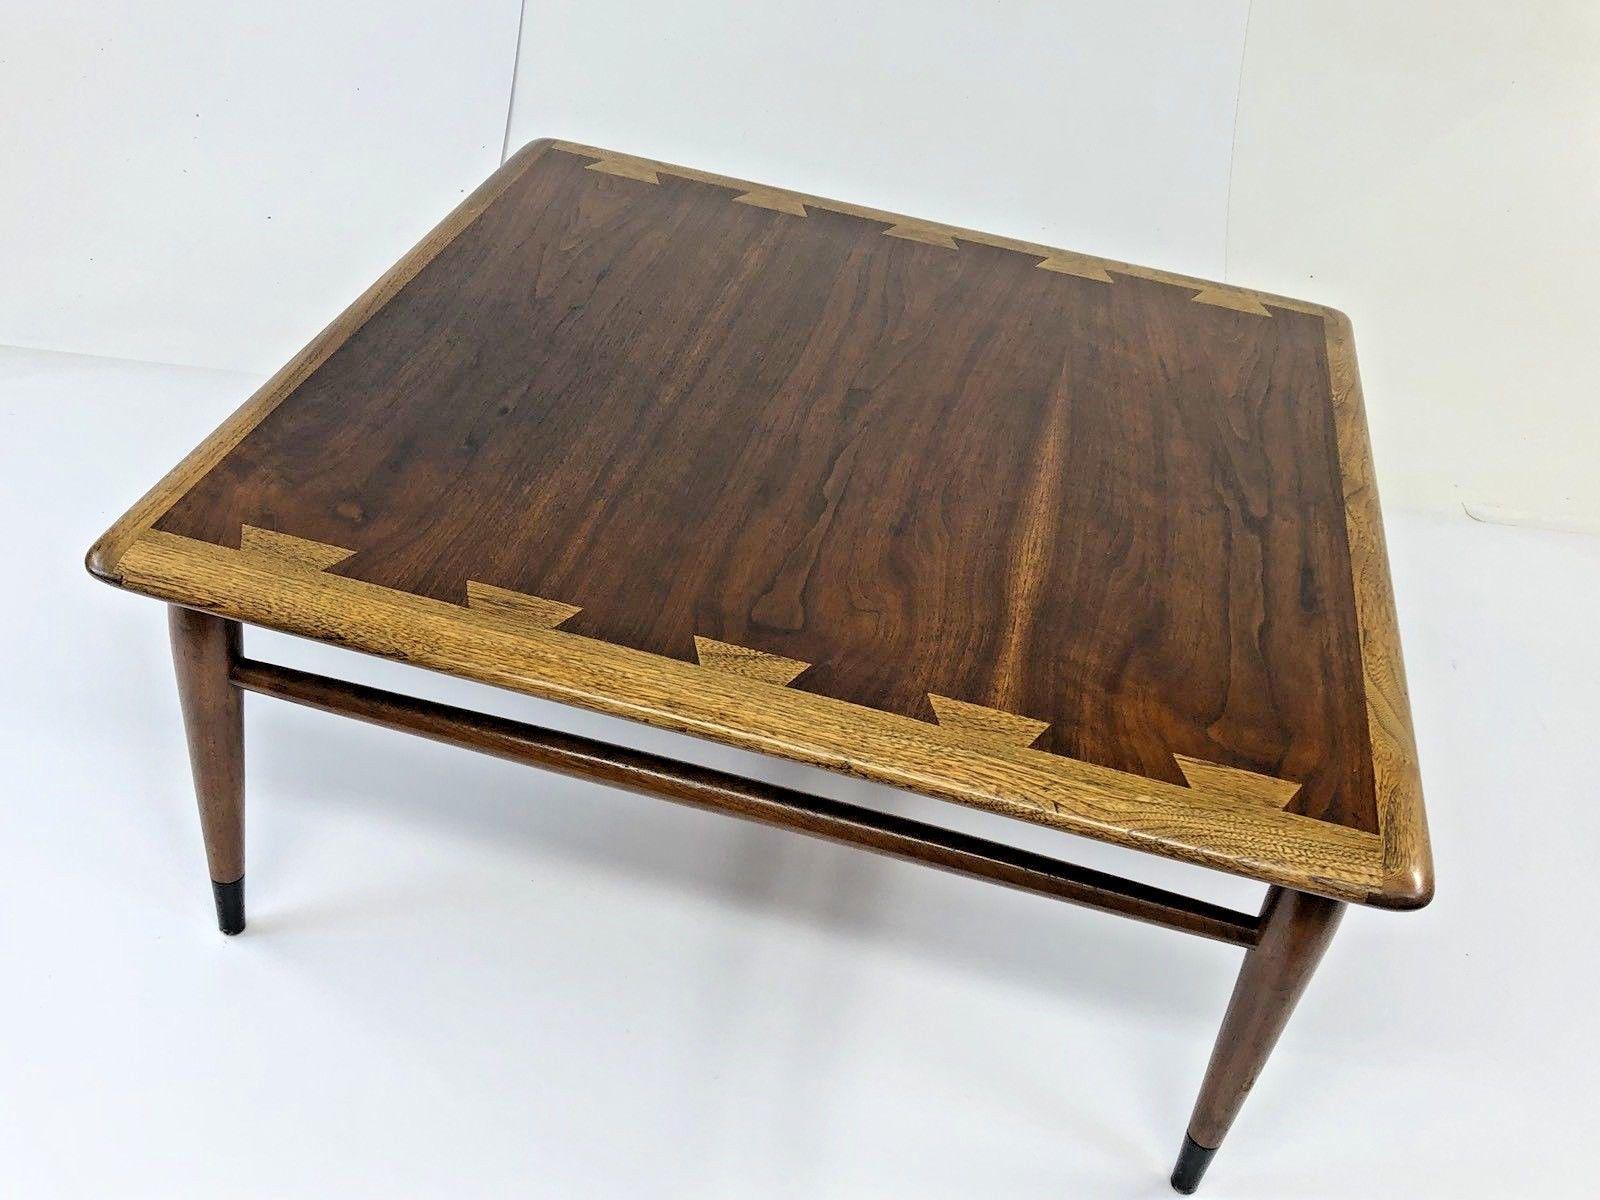 Mid Century Lane Acclaim Coffee Table Dovetail Modern Vintage Inlaid Walnut 60s Ebay Coffee Table Mid Century Coffee Table Lane Coffee Table [ 1200 x 1600 Pixel ]